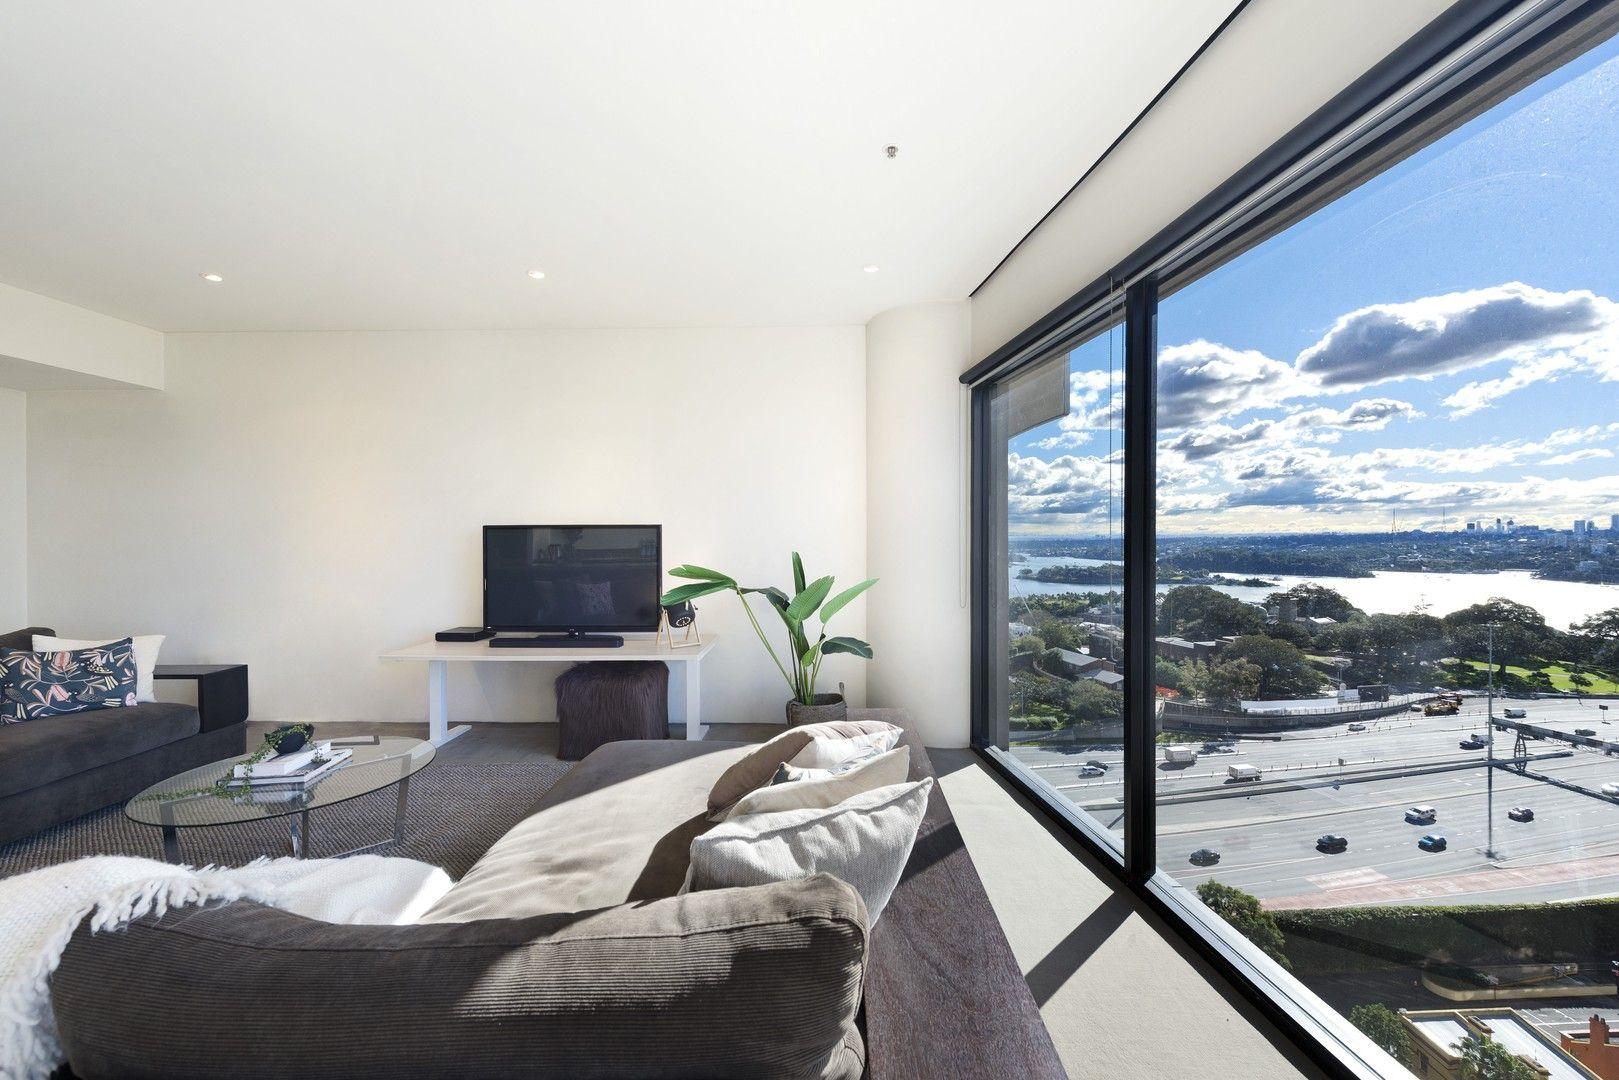 2 bedrooms Apartment / Unit / Flat in 1802/129 Harrington Street SYDNEY NSW, 2000